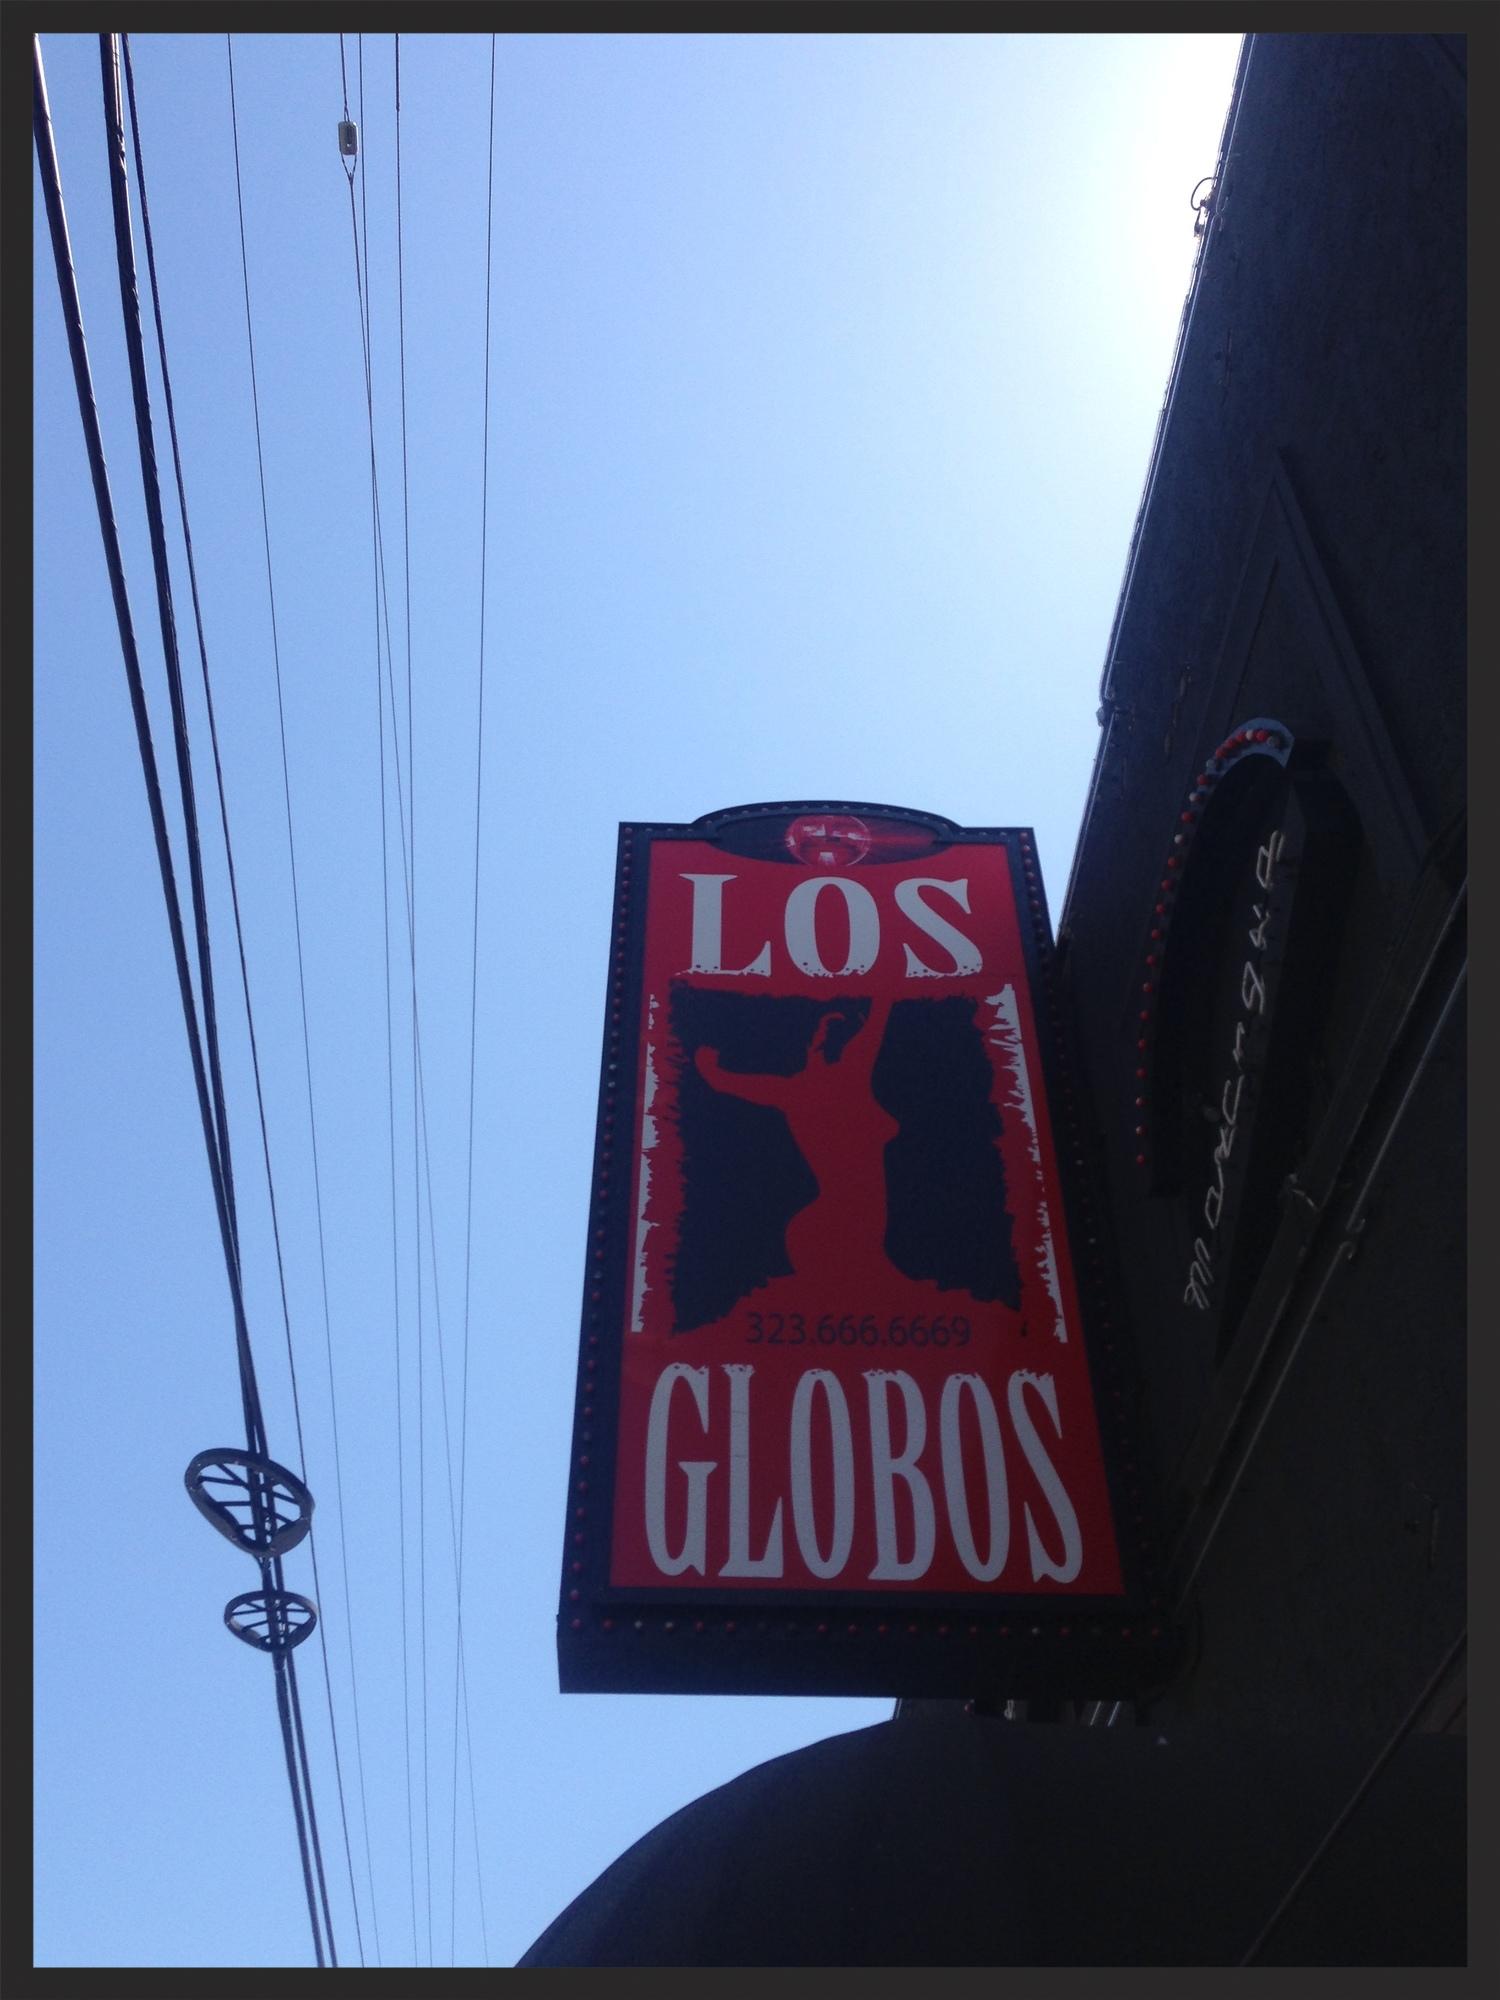 los-globos-sign-anders-larsson-burger-records-fest.jpg